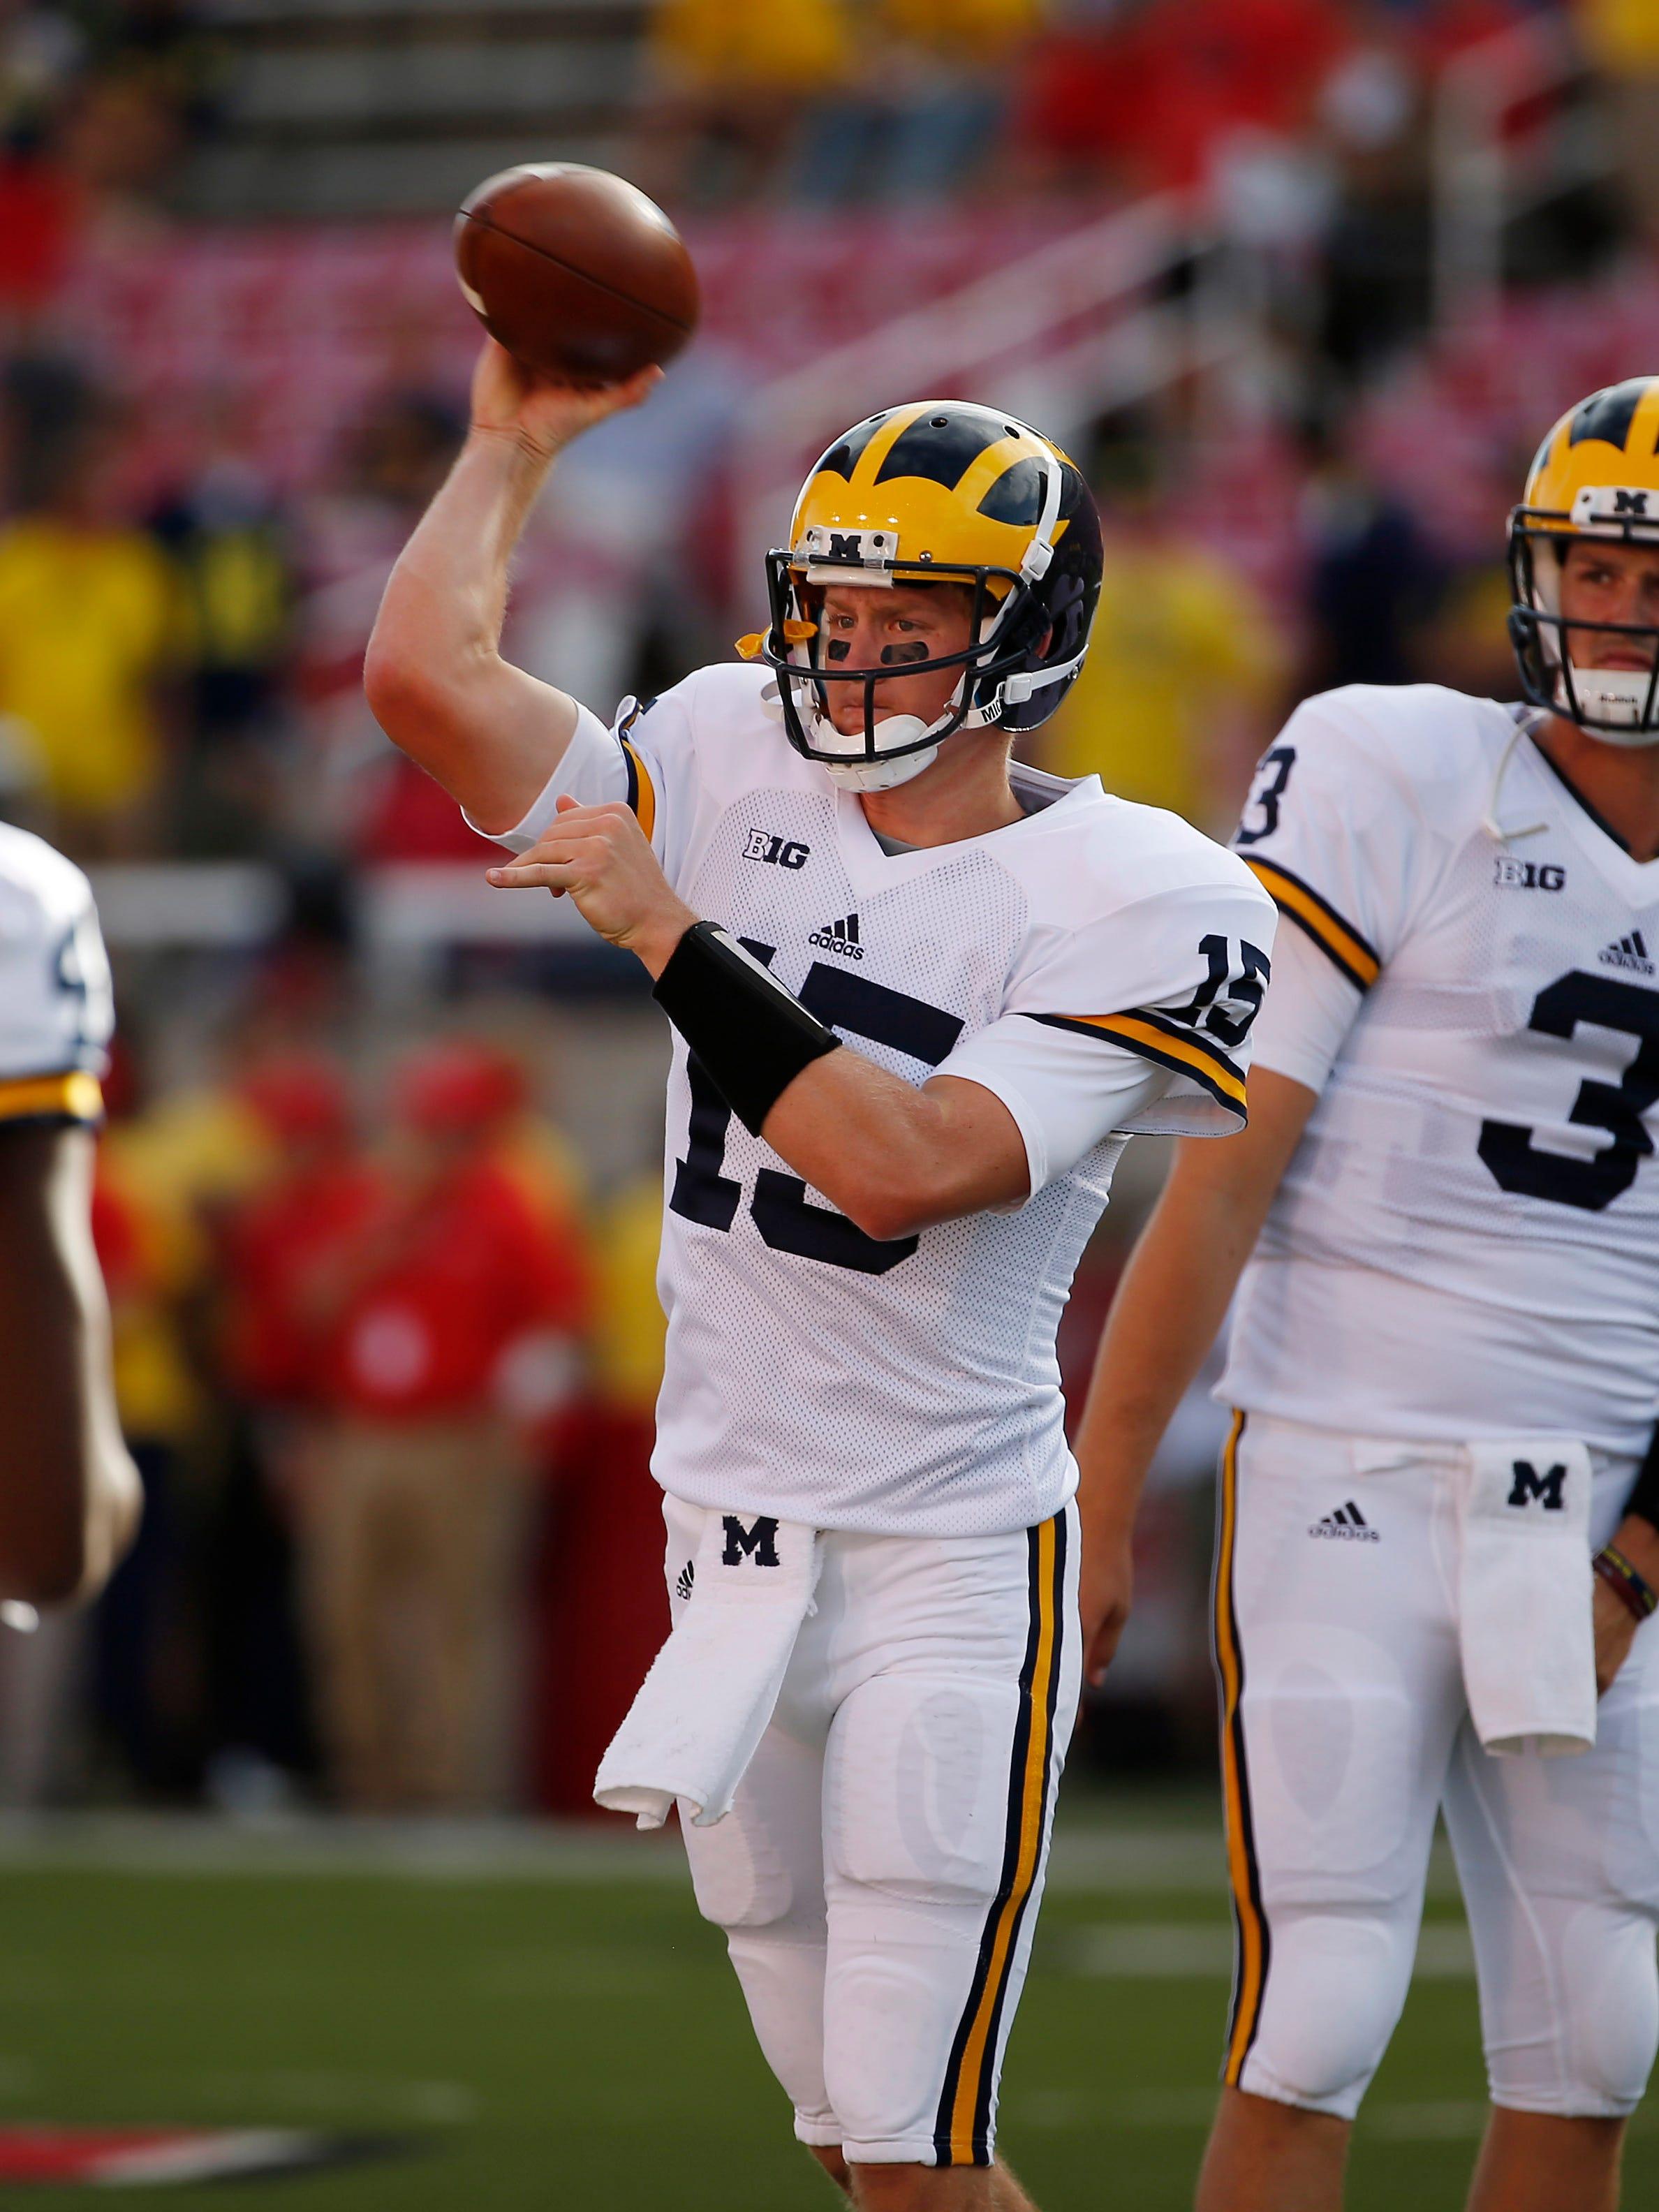 Michigan starts transfer Jake Rudock at quarterback